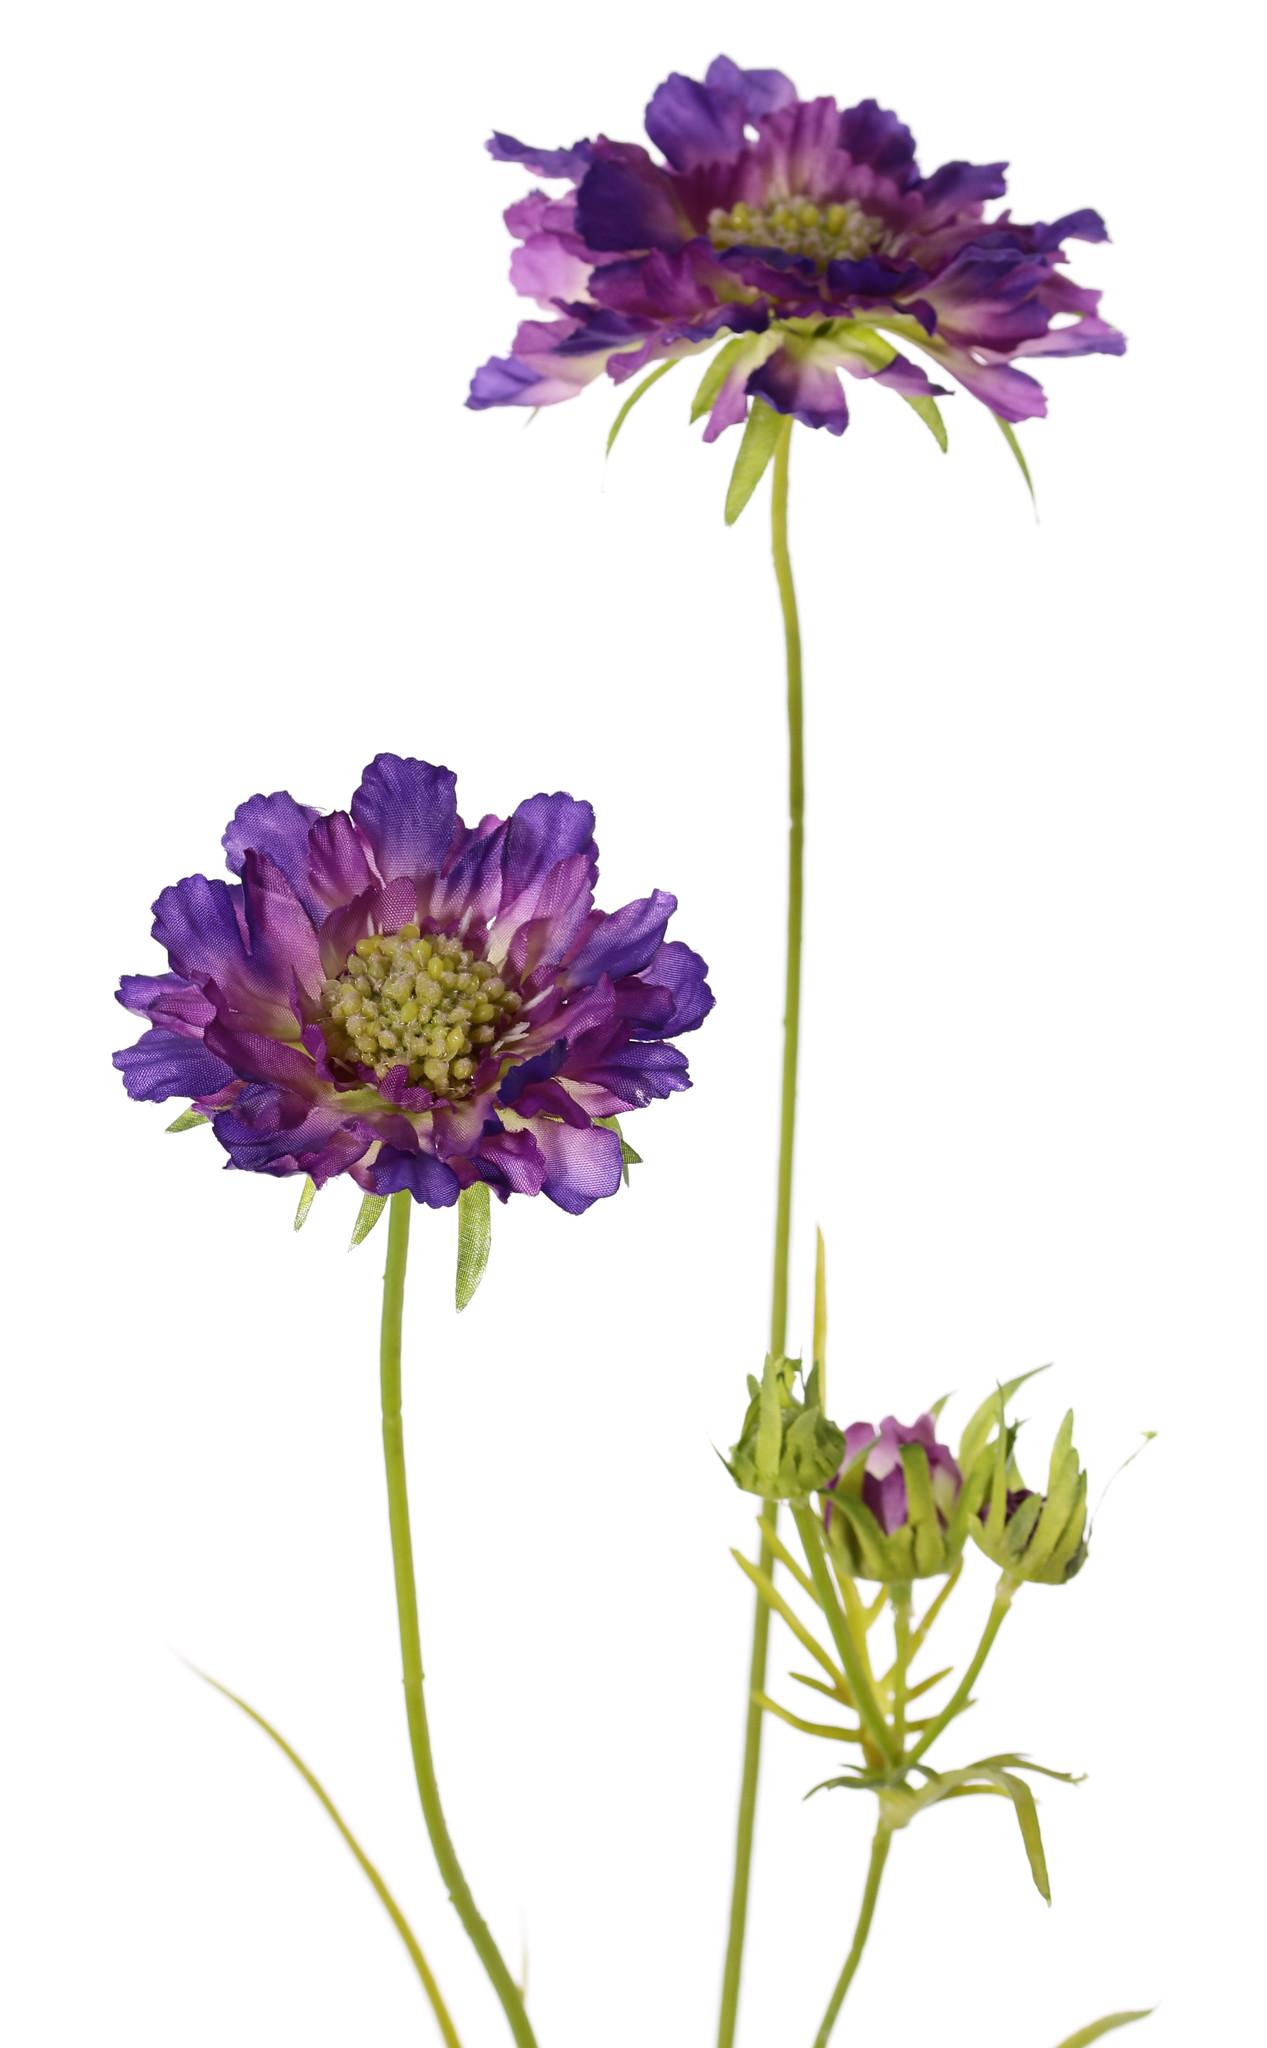 Scabiosa (Duifkruid), x3, 2 bloemen, Ø 10/8cm, 3 knop & 4 blad, 80cm